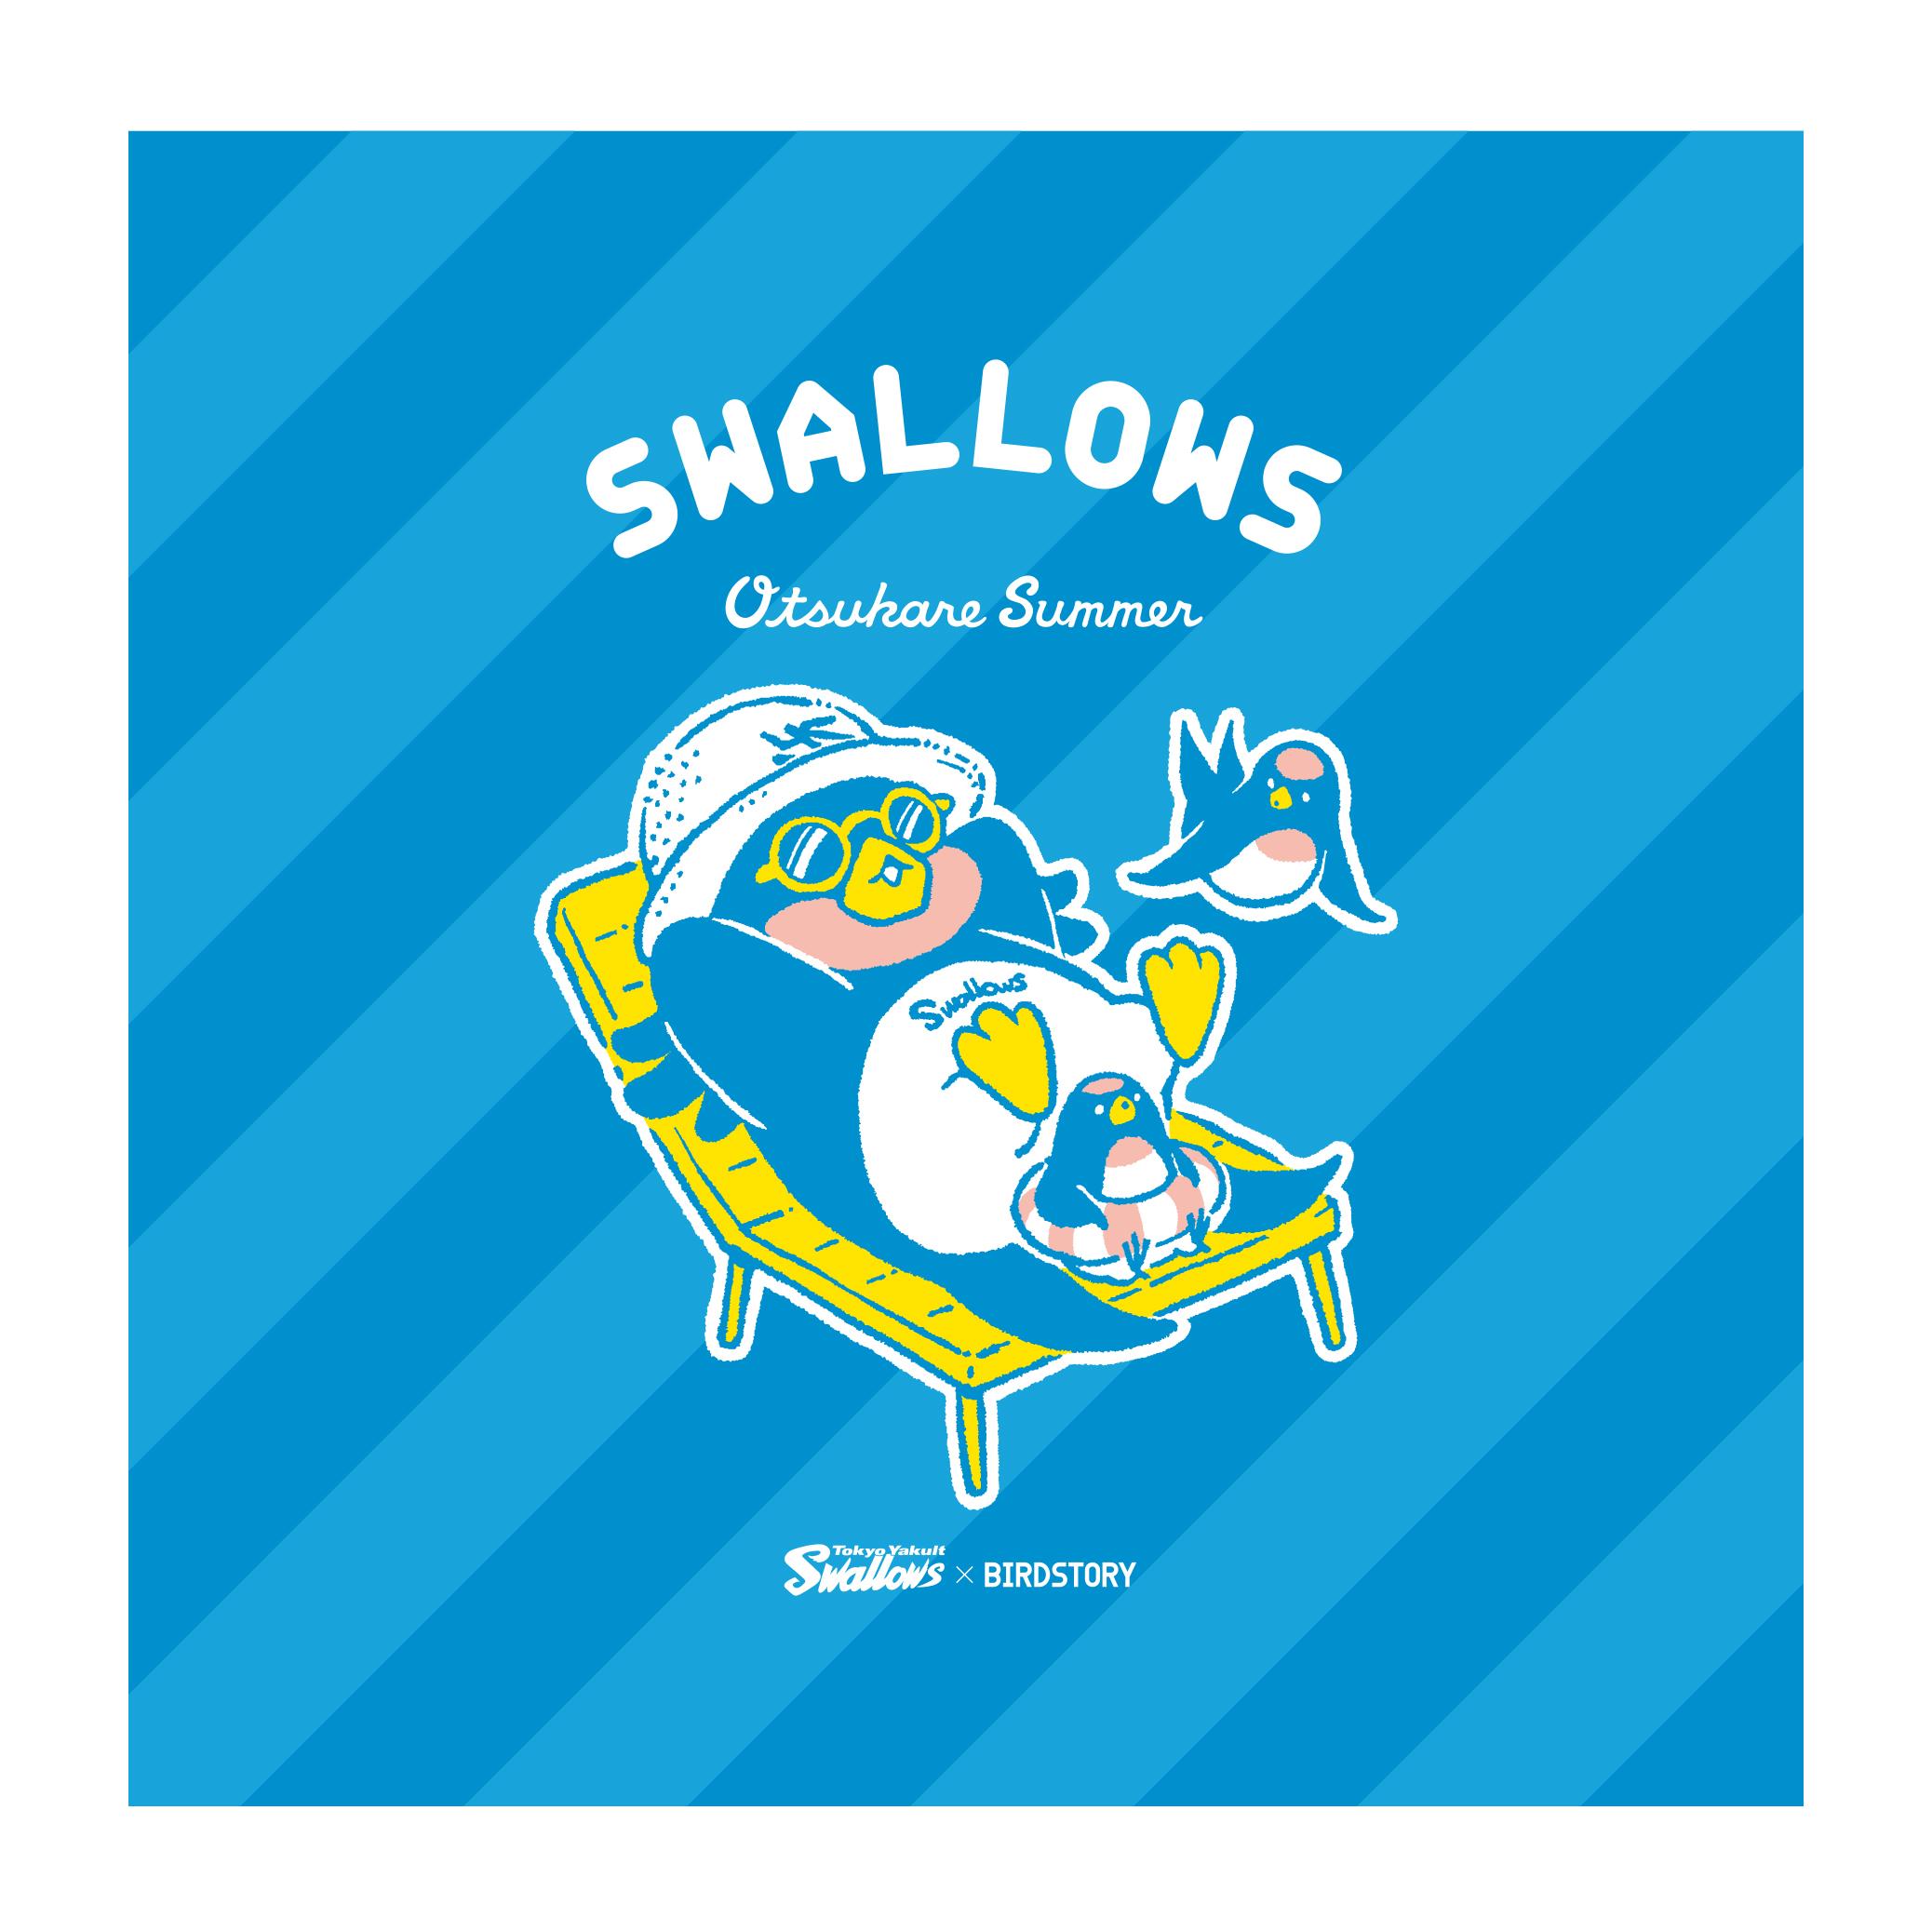 SWALLOWS×BIRDSTORY (ビーチ) 冷感ハンドタオル